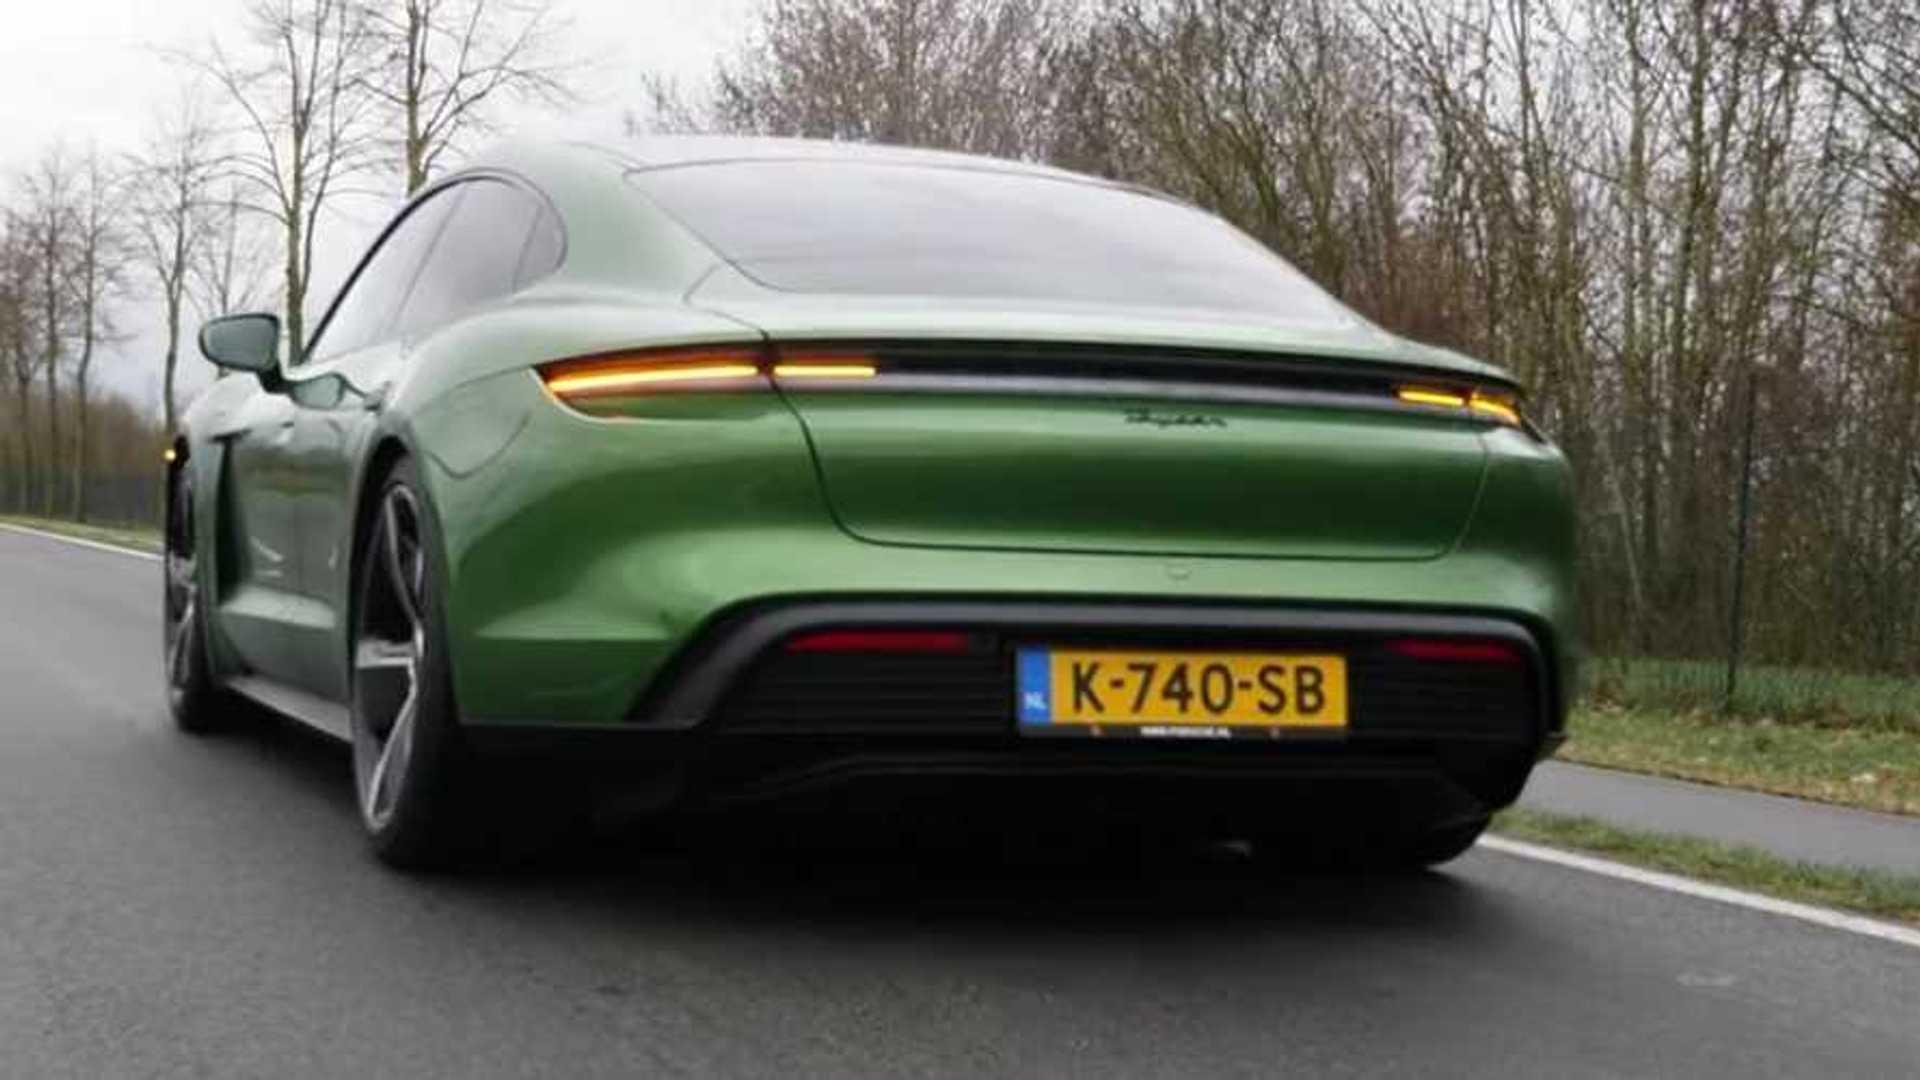 Rear-Drive Porsche Taycan Acceleration Test Shows What EV Can Do